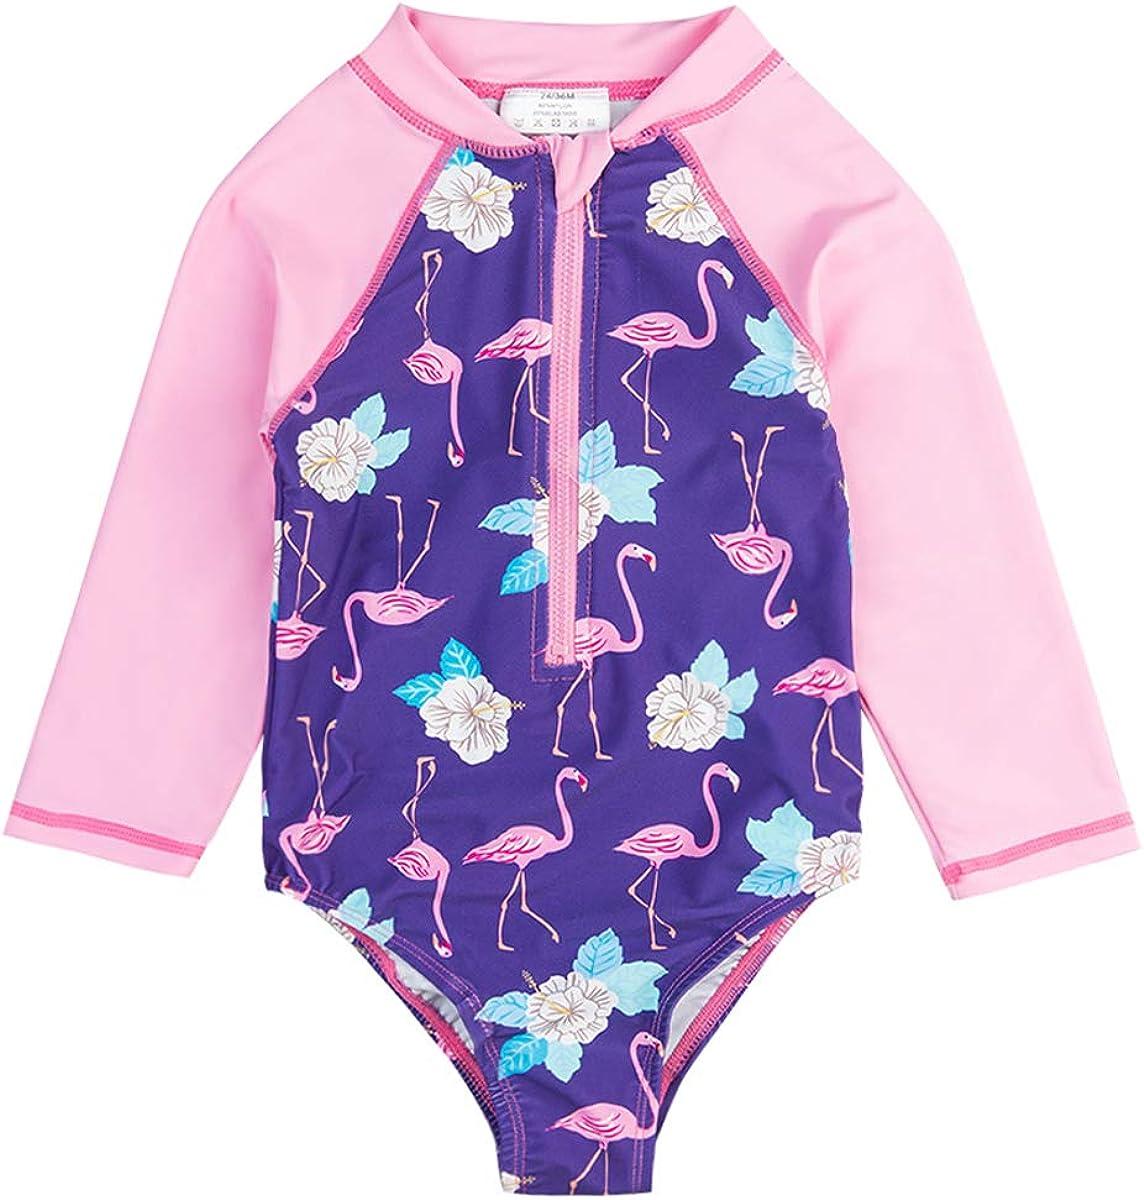 Wishere Baby Girl Sunsuit One-Piece Guard Low price Rash Swimwear store Swimsuit